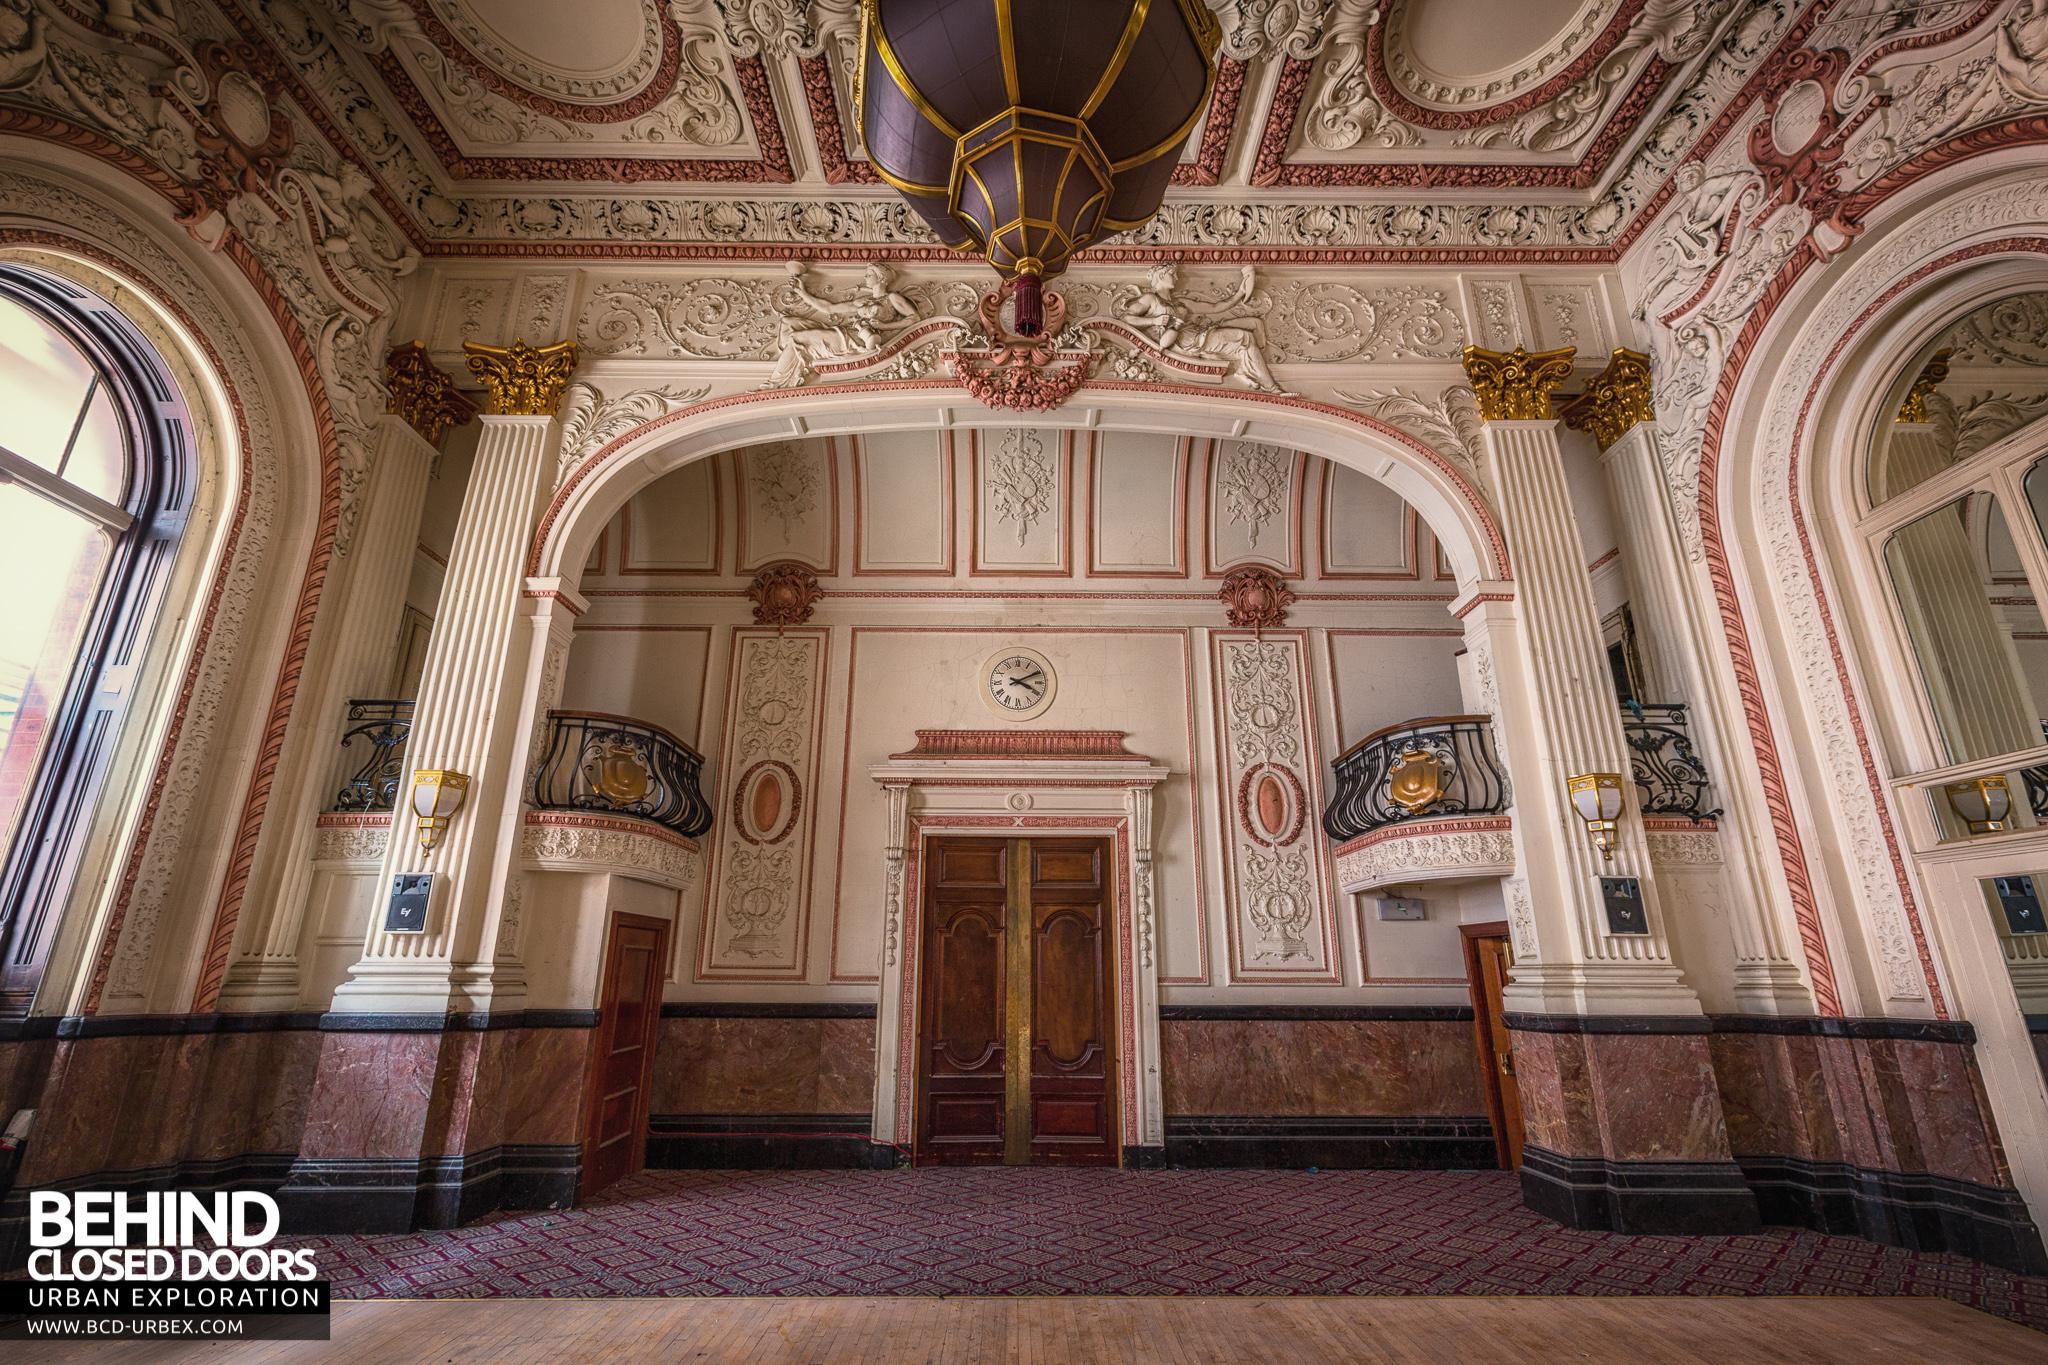 The Grand Hotel Birmingham Uk 187 Urbex Behind Closed